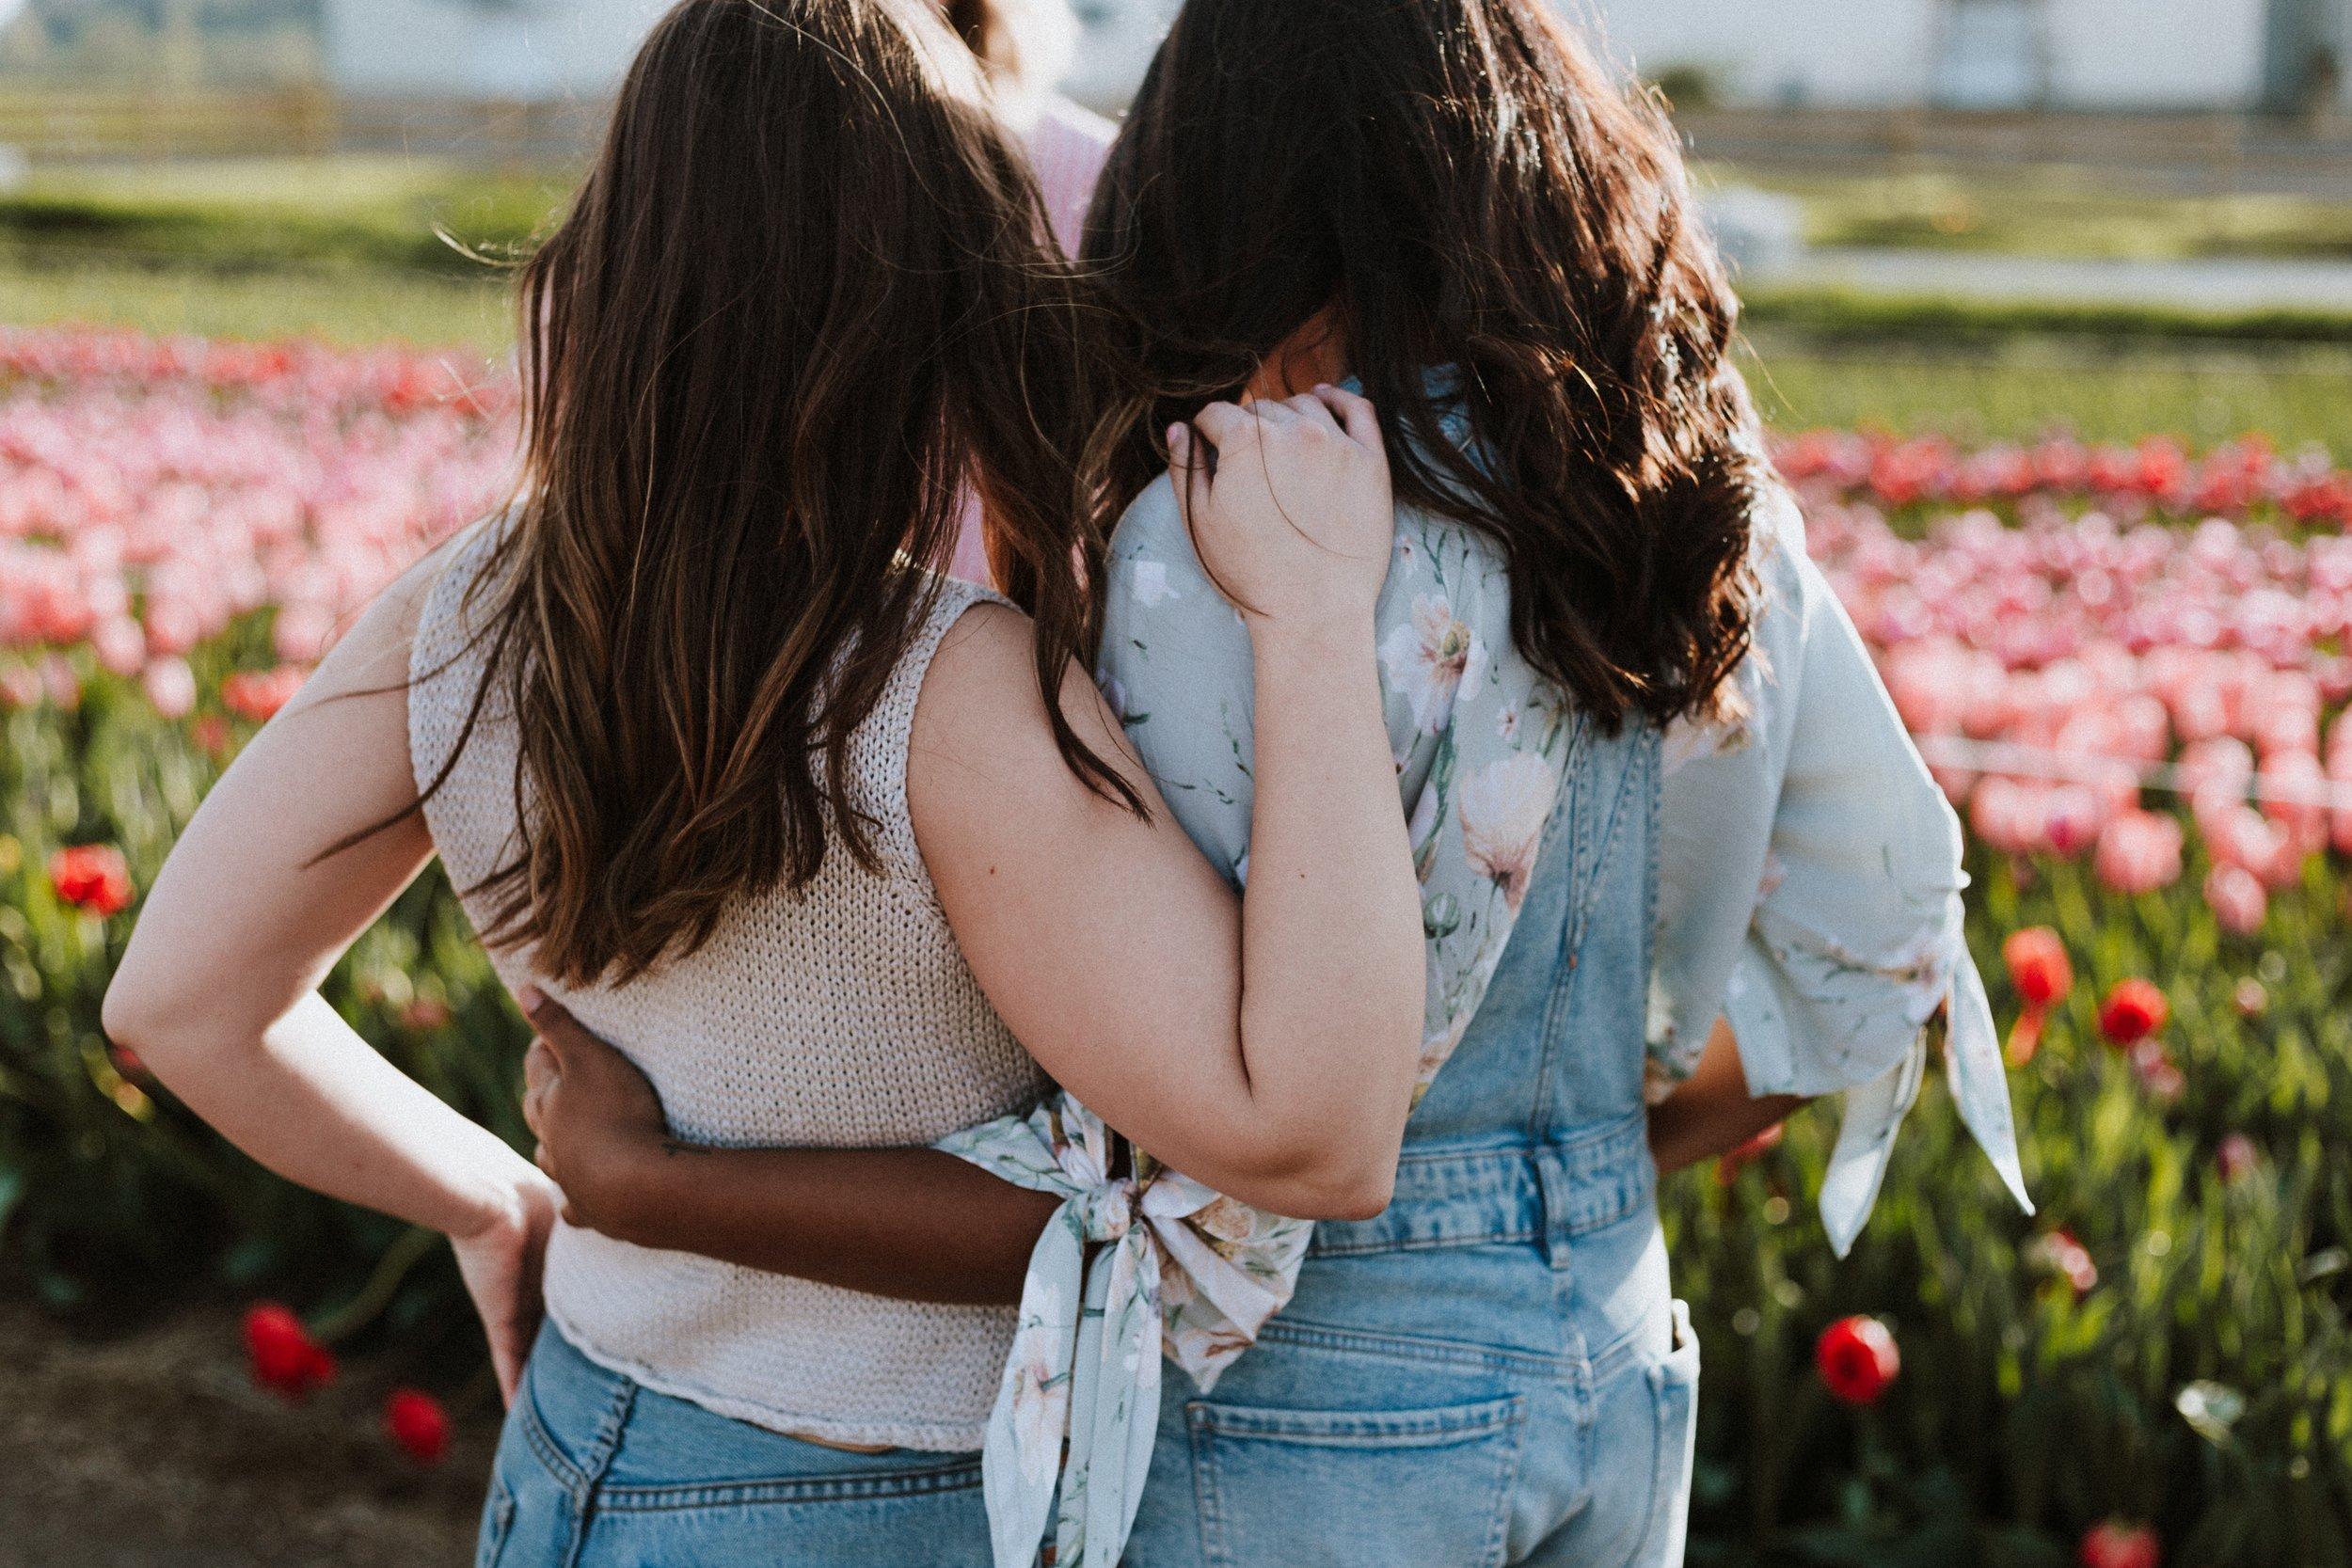 women hugging by flowers.jpg